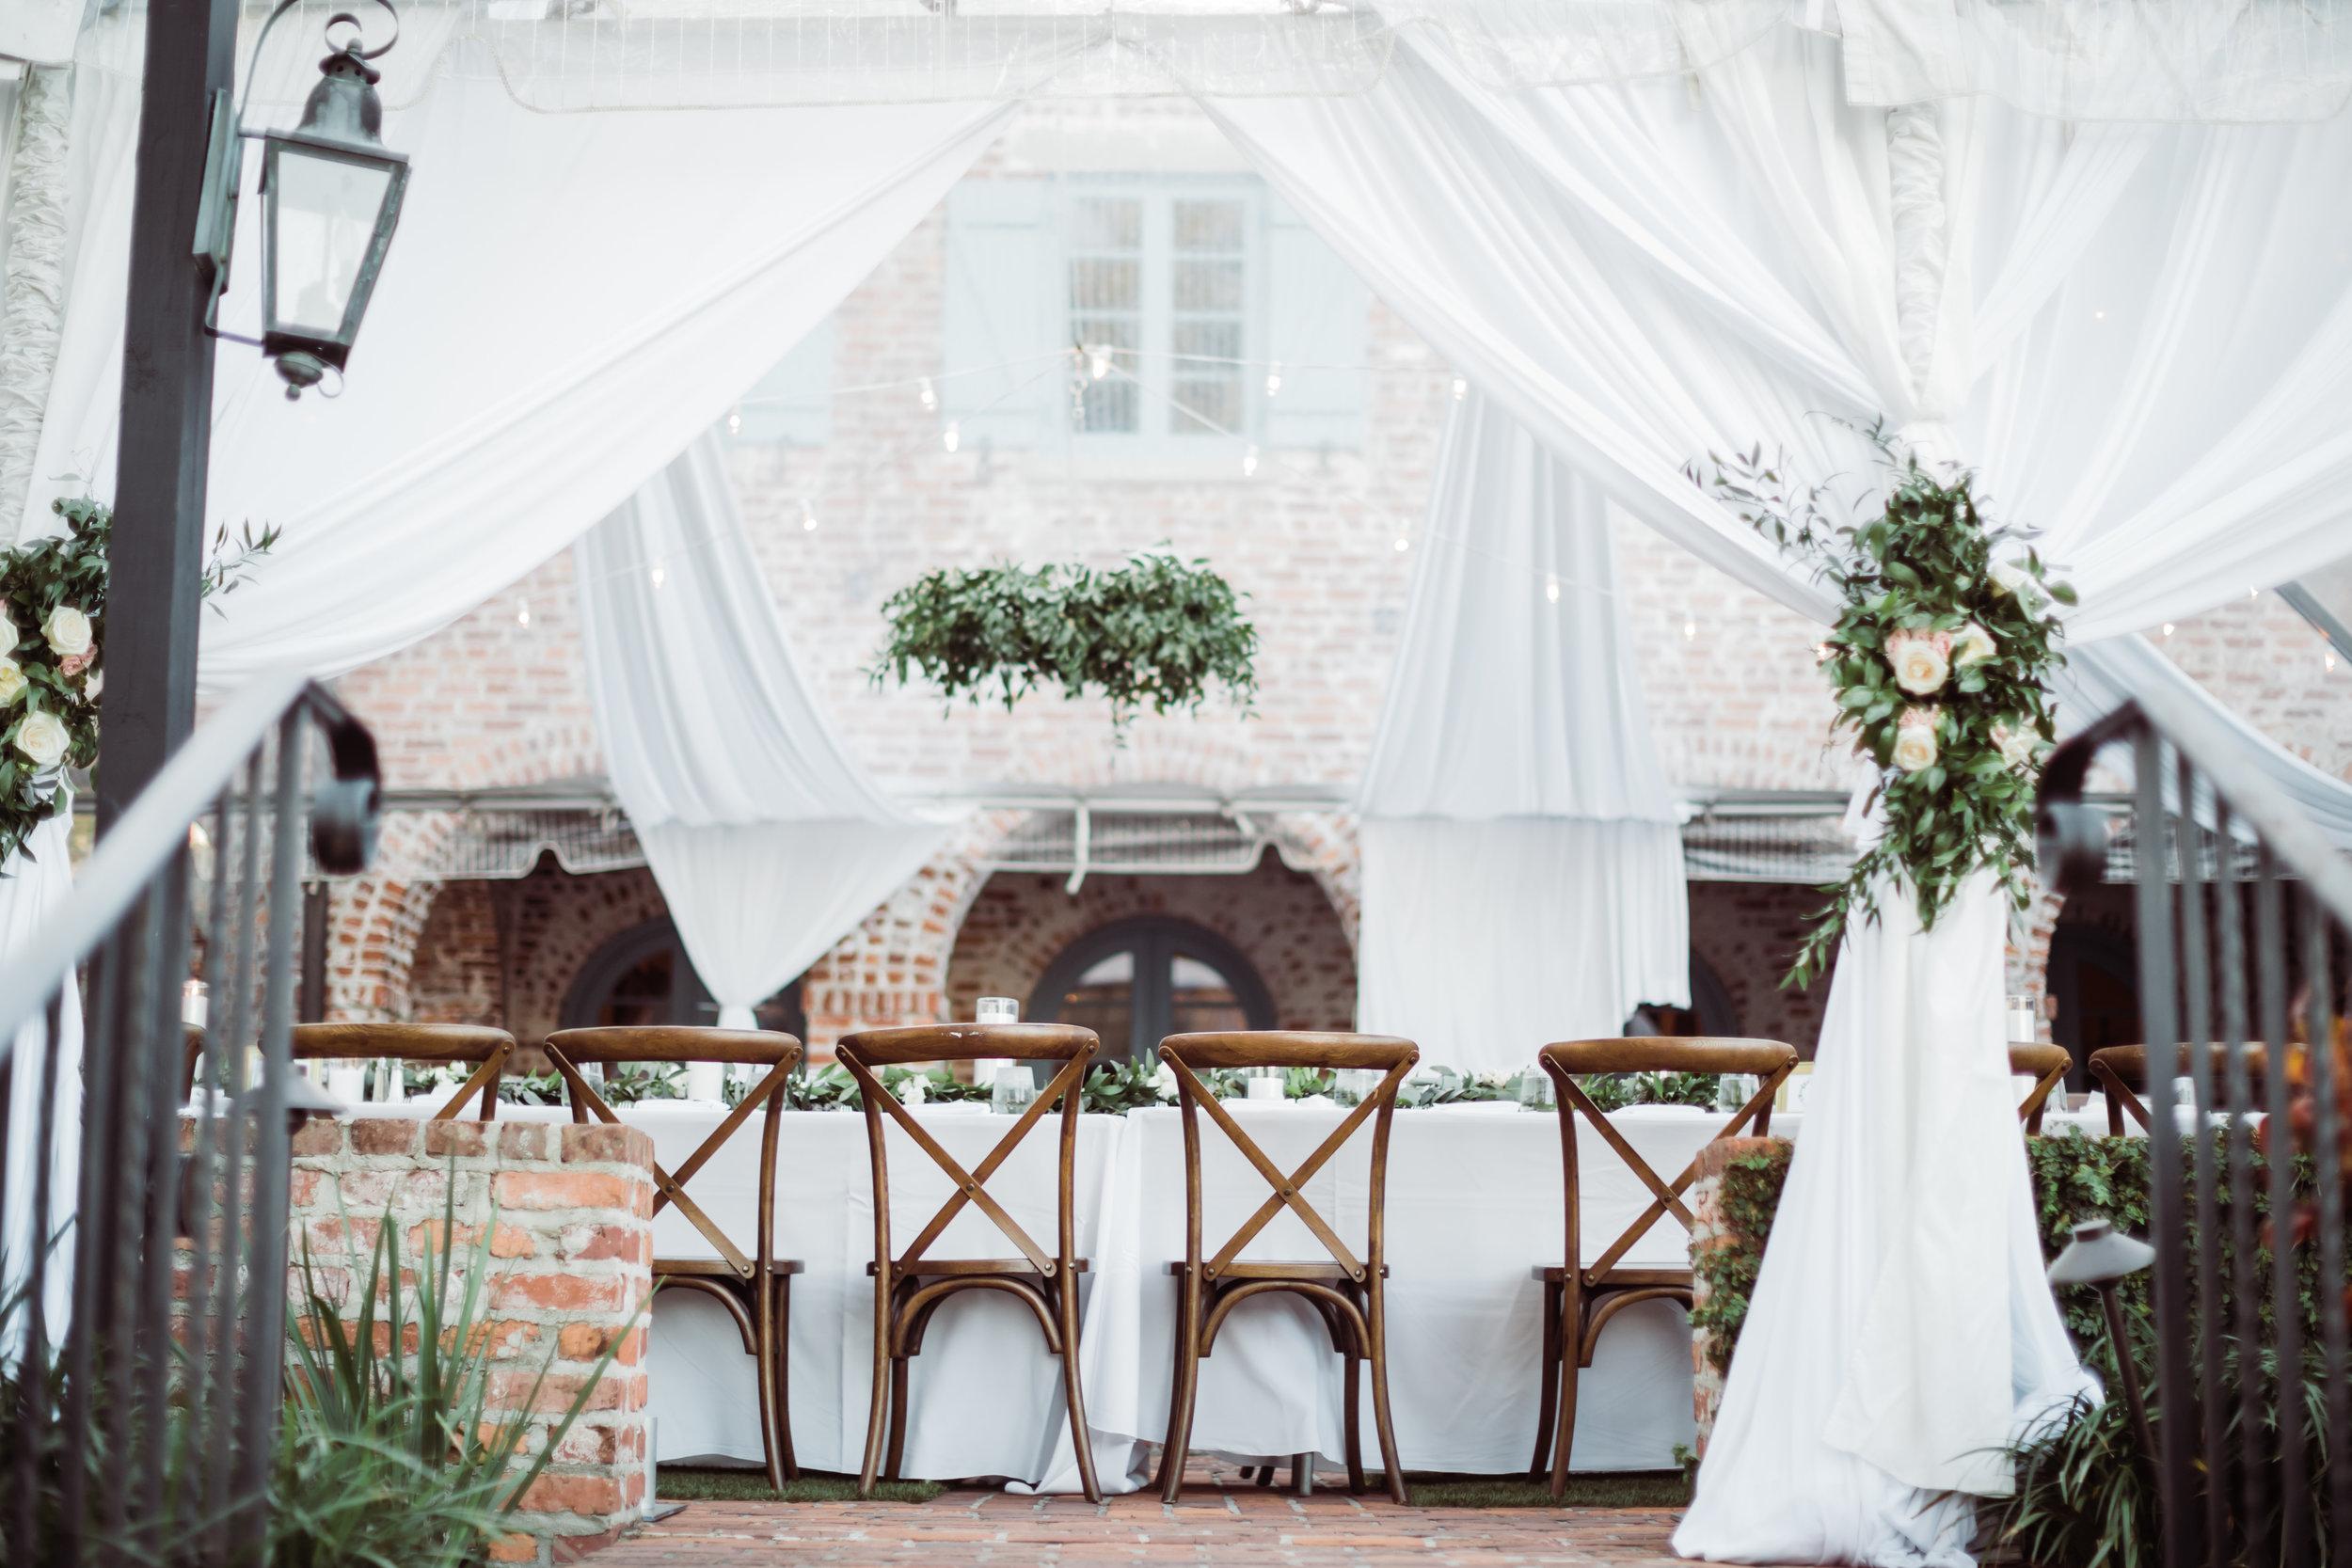 2017.10.15 Steffi and Elliott Simmonds Casa Feliz Wedding (621 of 969).jpg